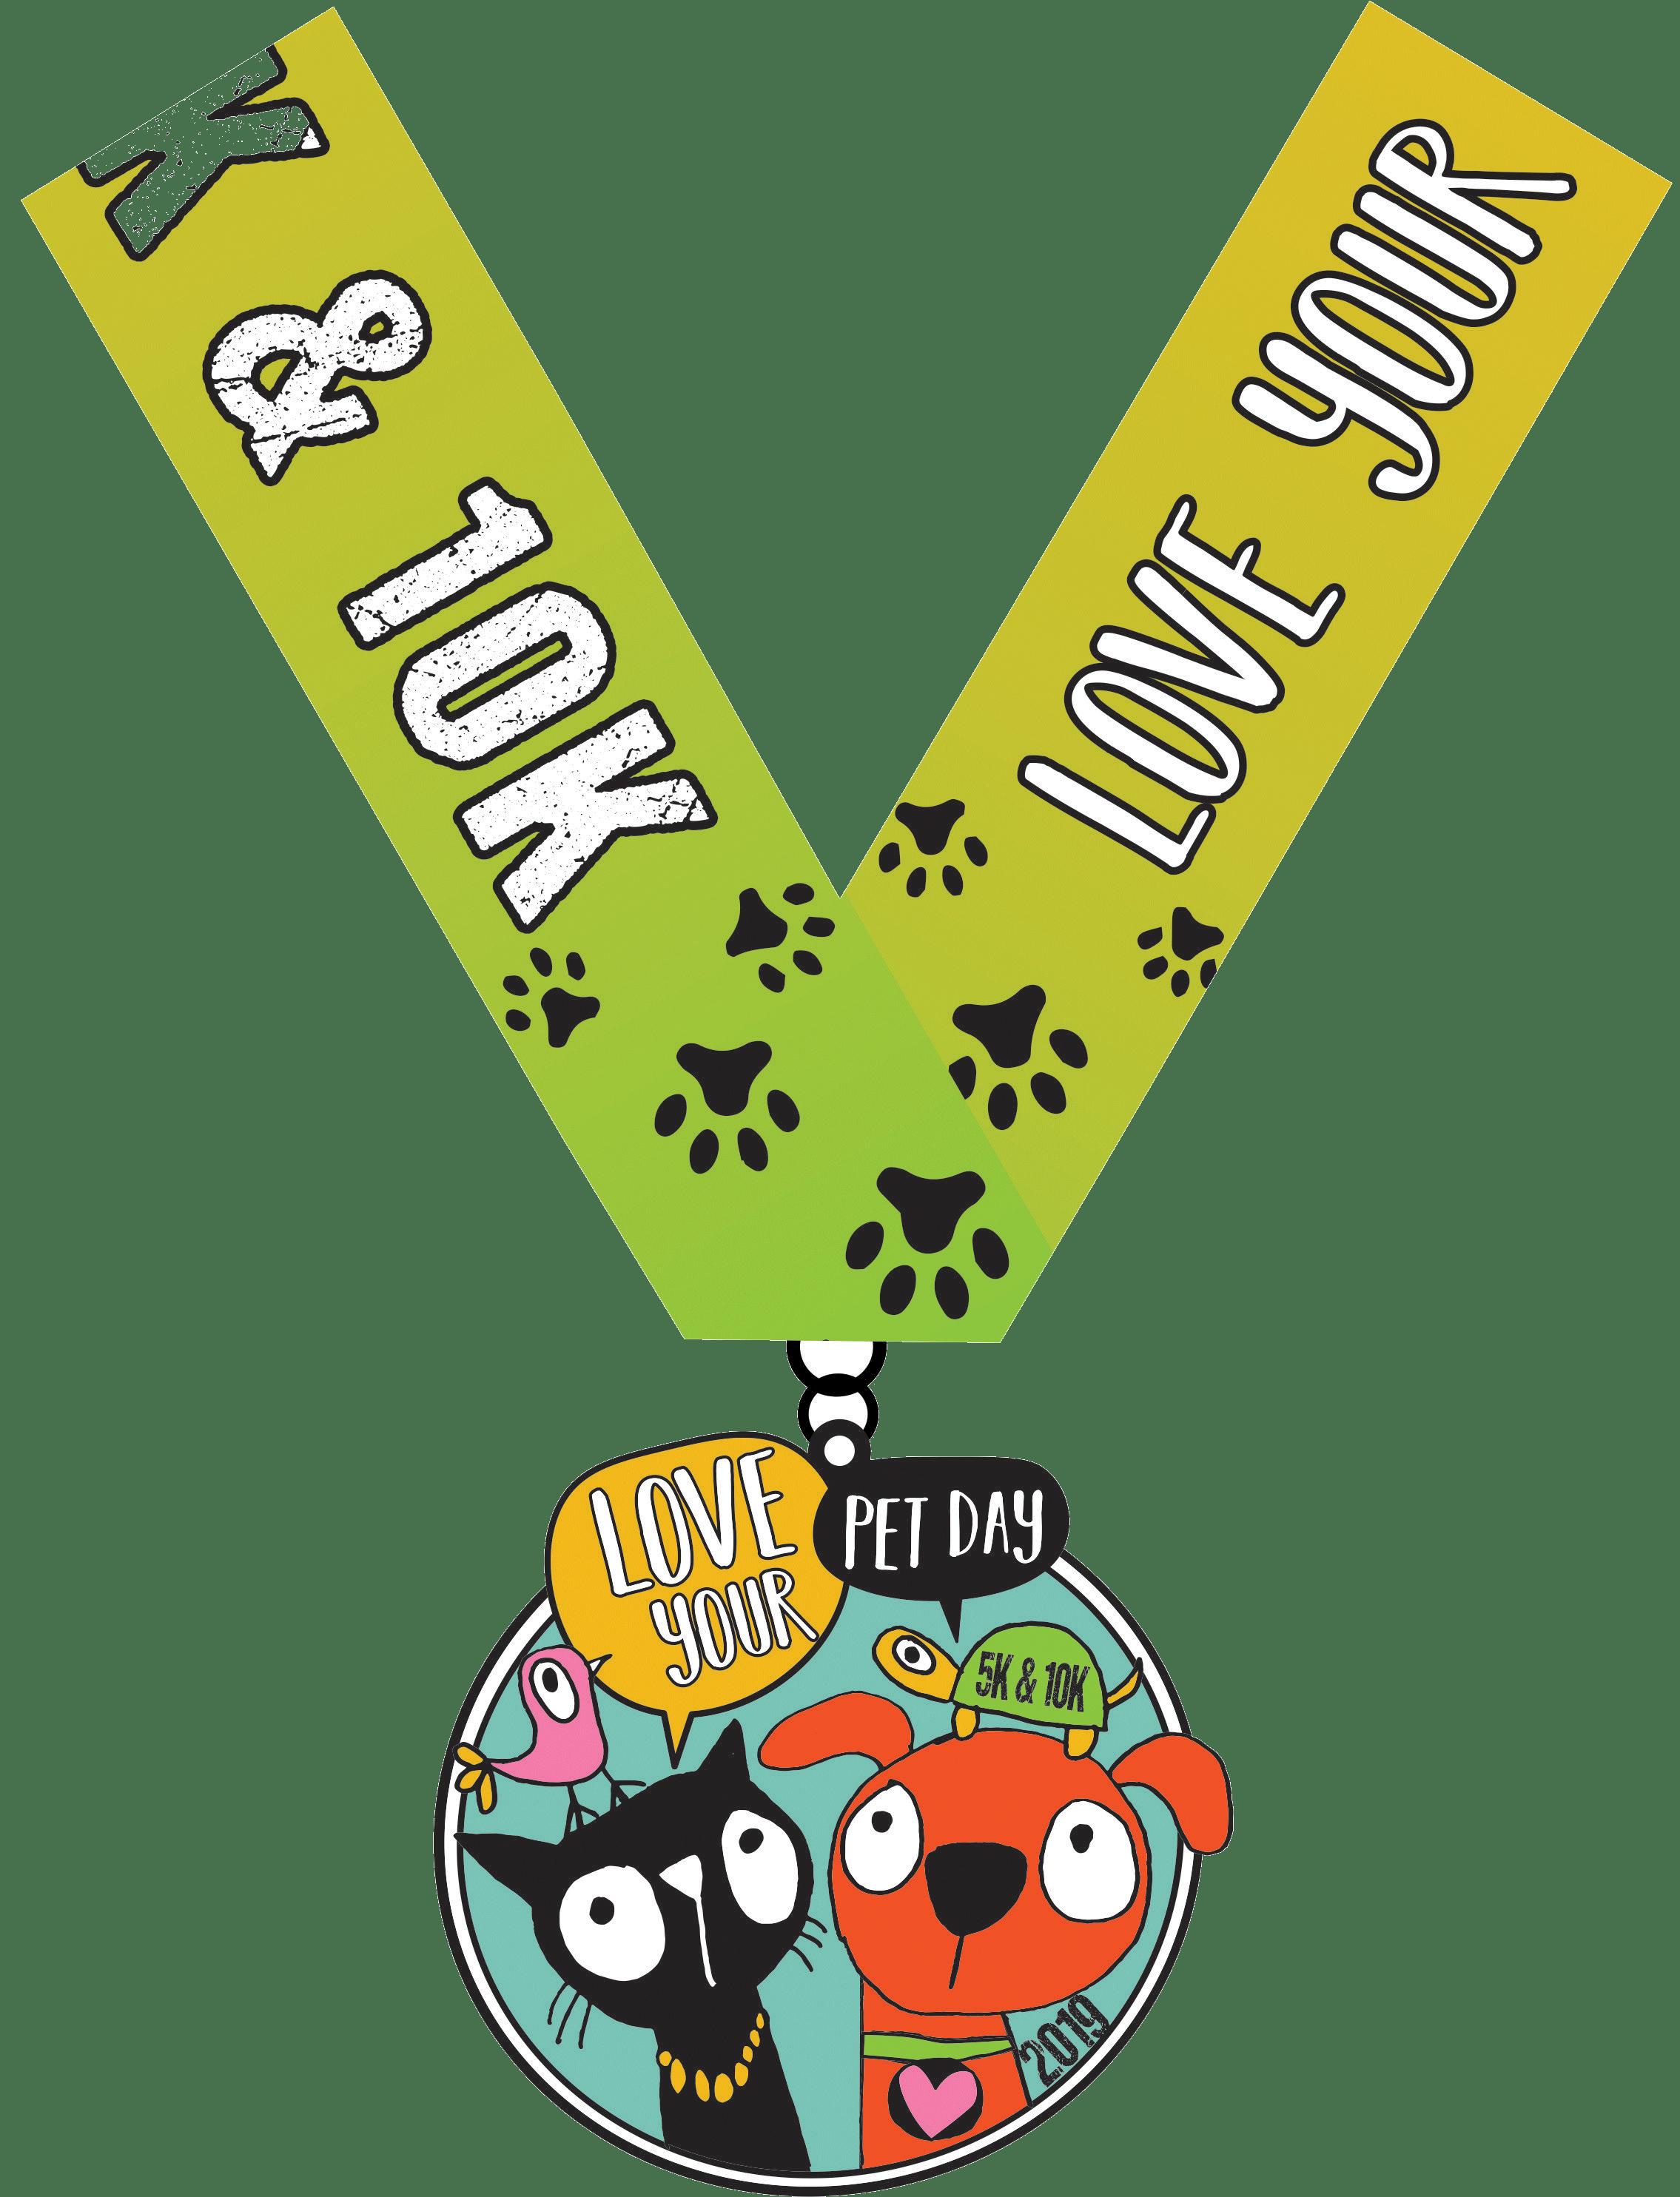 2019 Love Your Pet Day 5K & 10K -Scottsdale